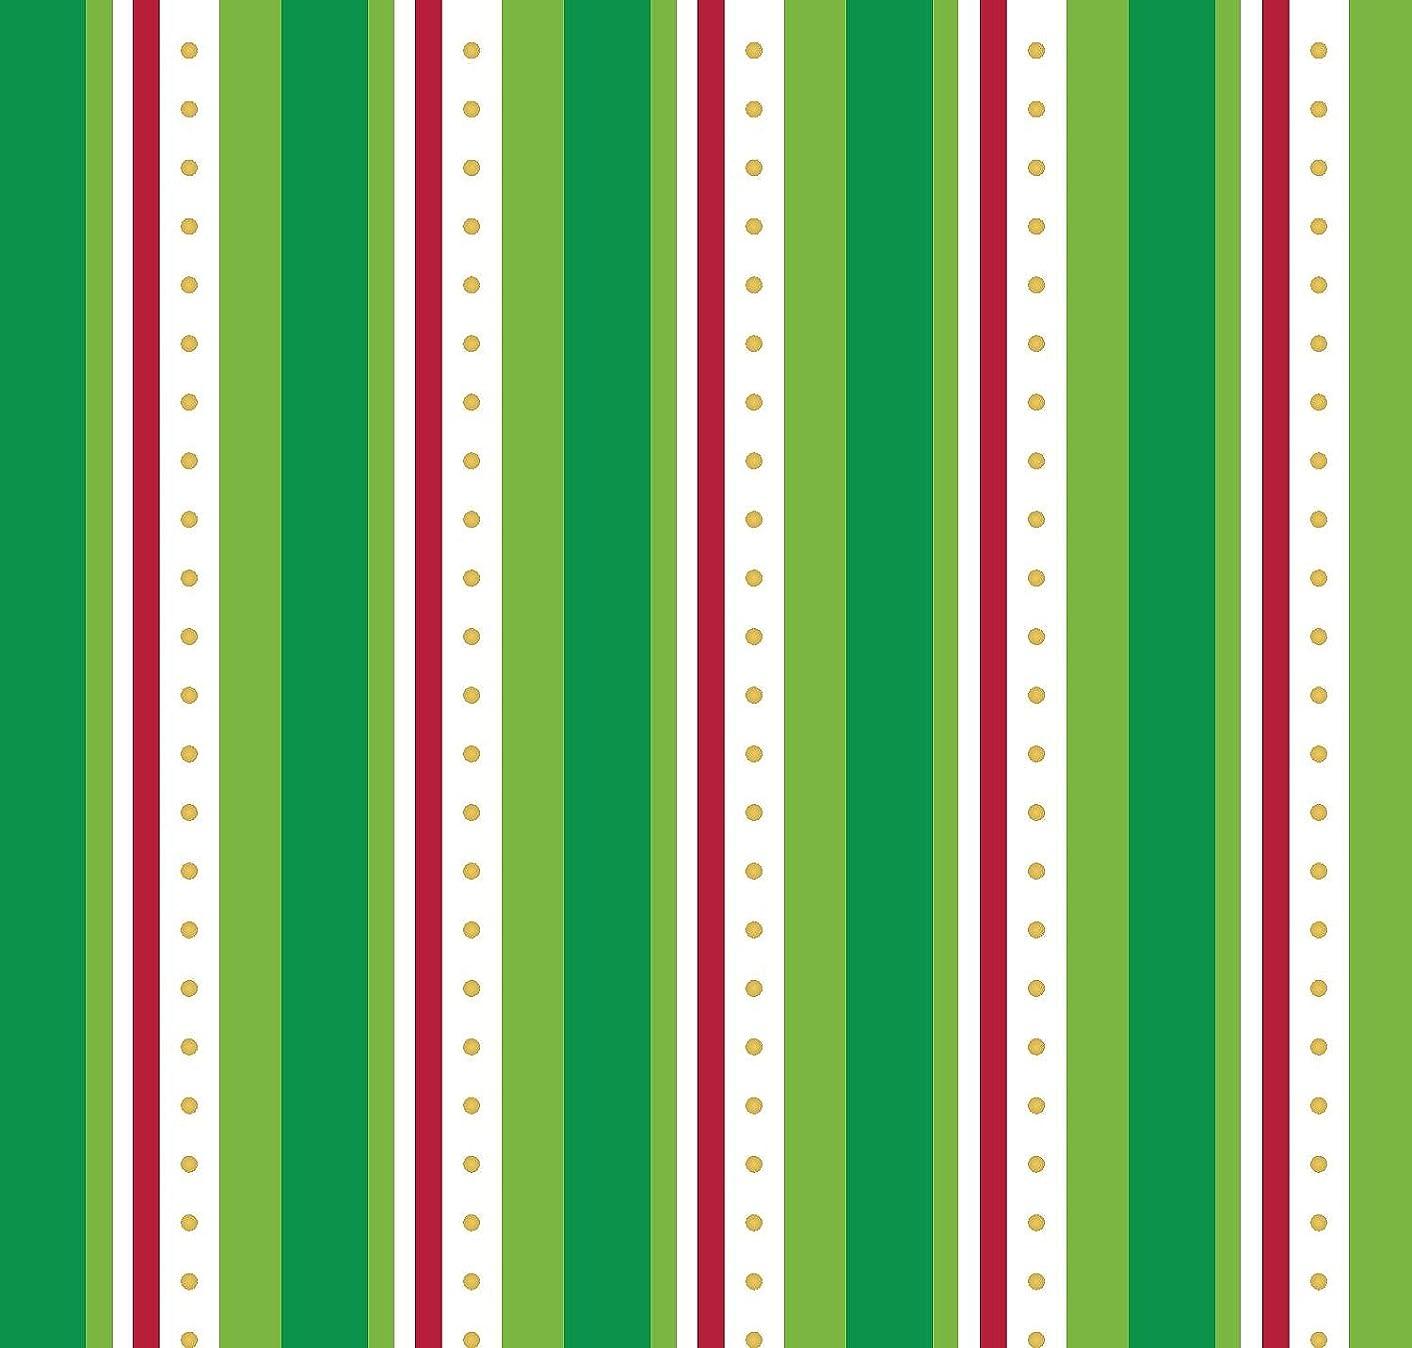 Glitter Stripe Green and Red Fabric, RTC Precut Fabric (1 Yard)